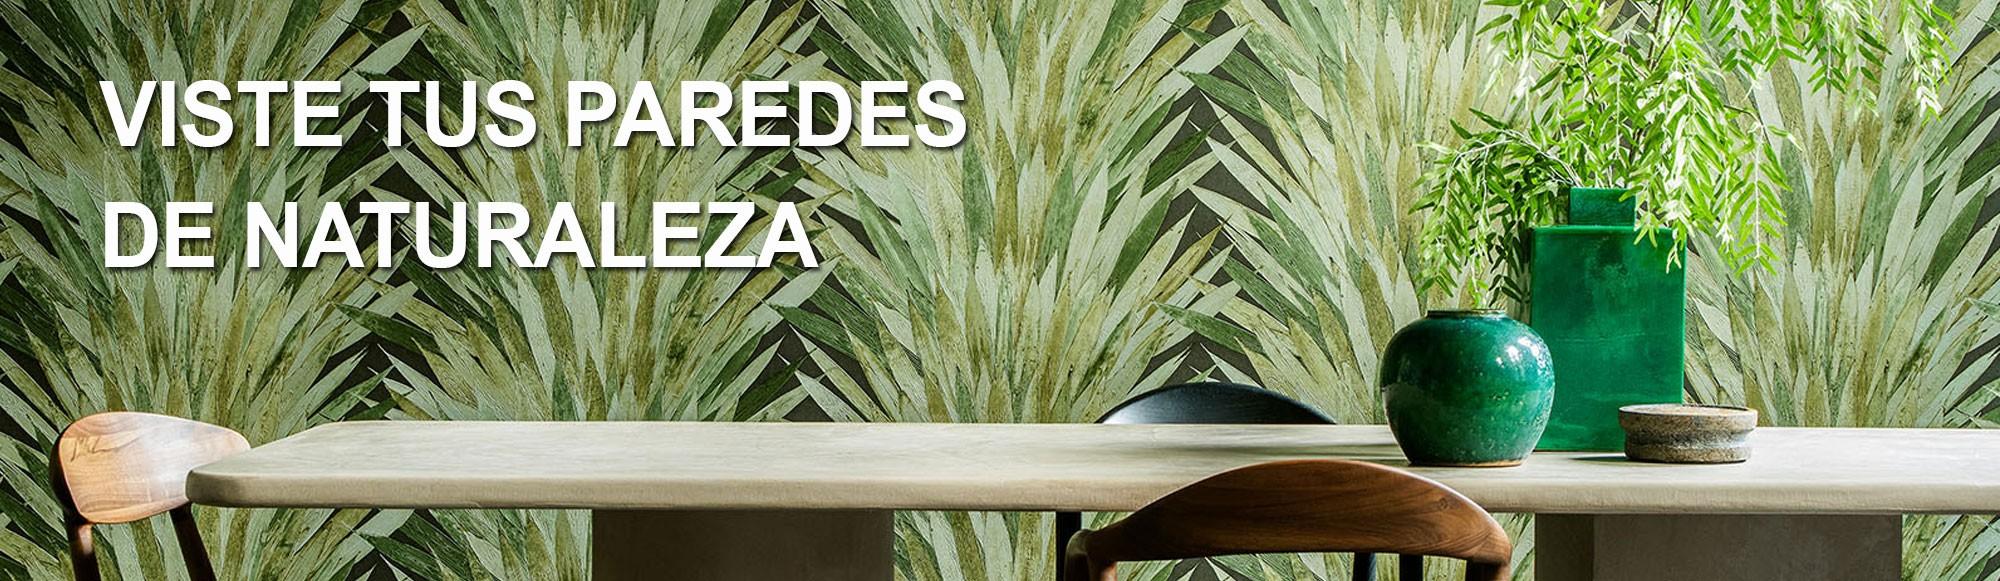 Viste tus paredes de naturaleza con la colección Selva de Arte en Papeles Pintados Decorativos